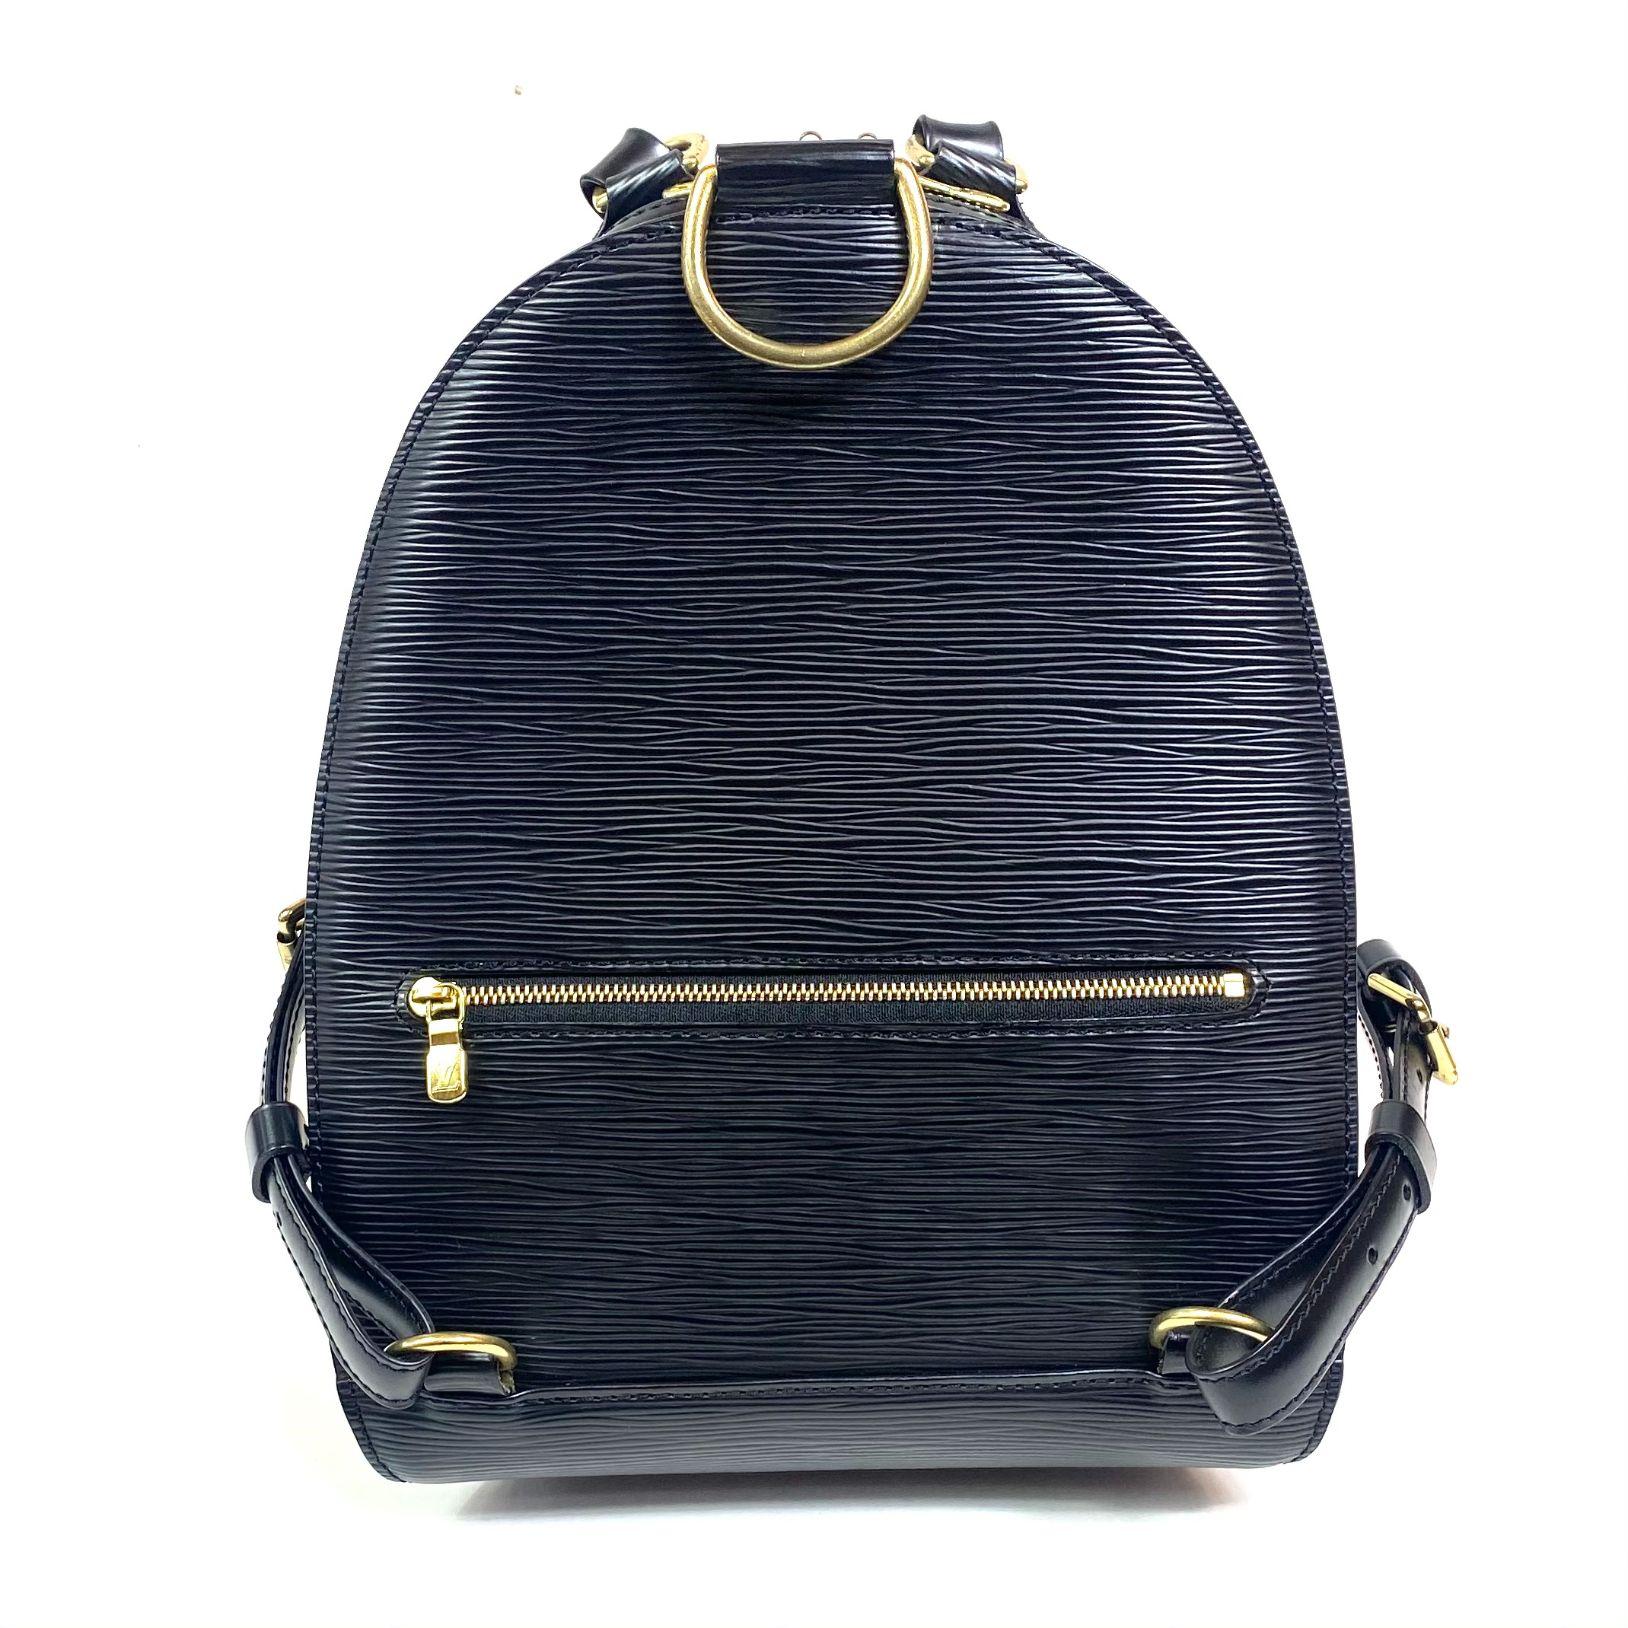 Mochila Louis Vuitton Mabillon Epi Preta